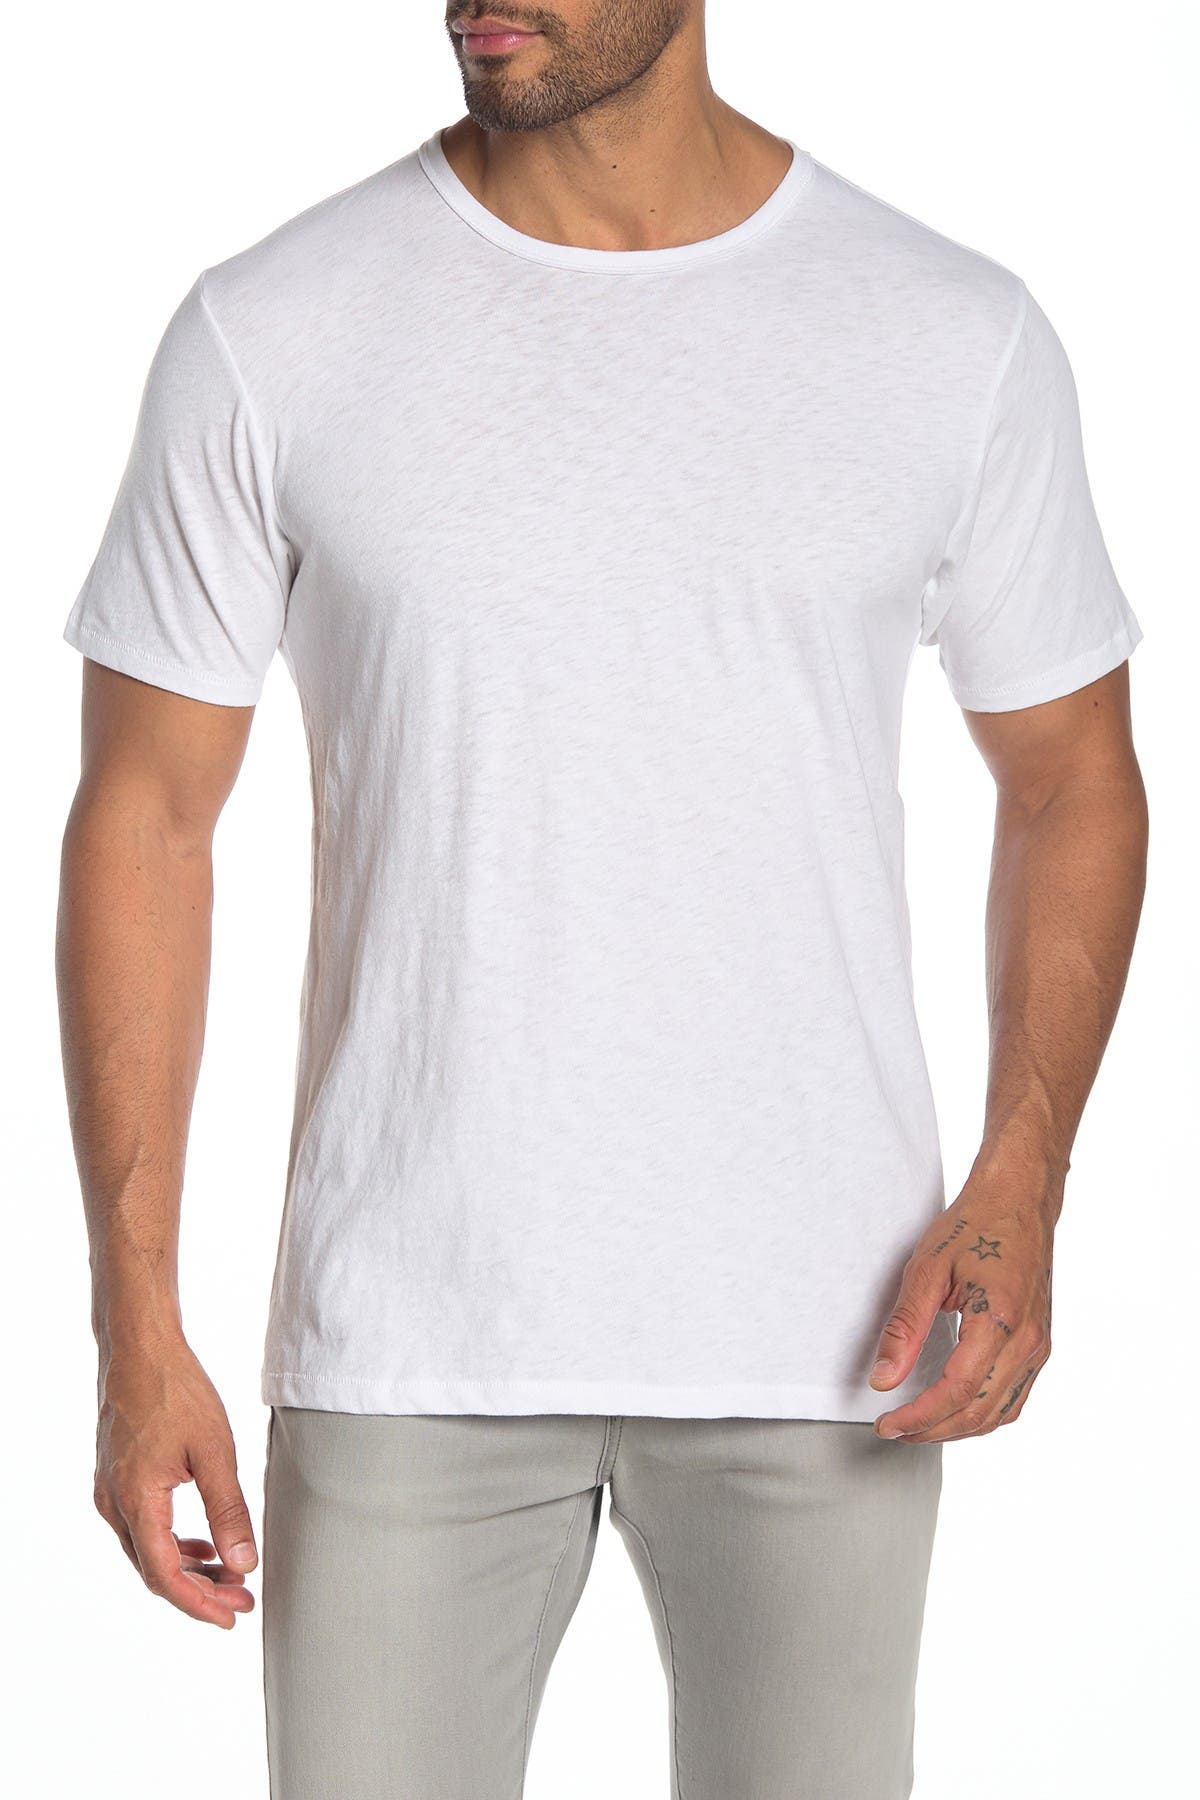 Image of Rag & Bone Core Crew Neck T-Shirt